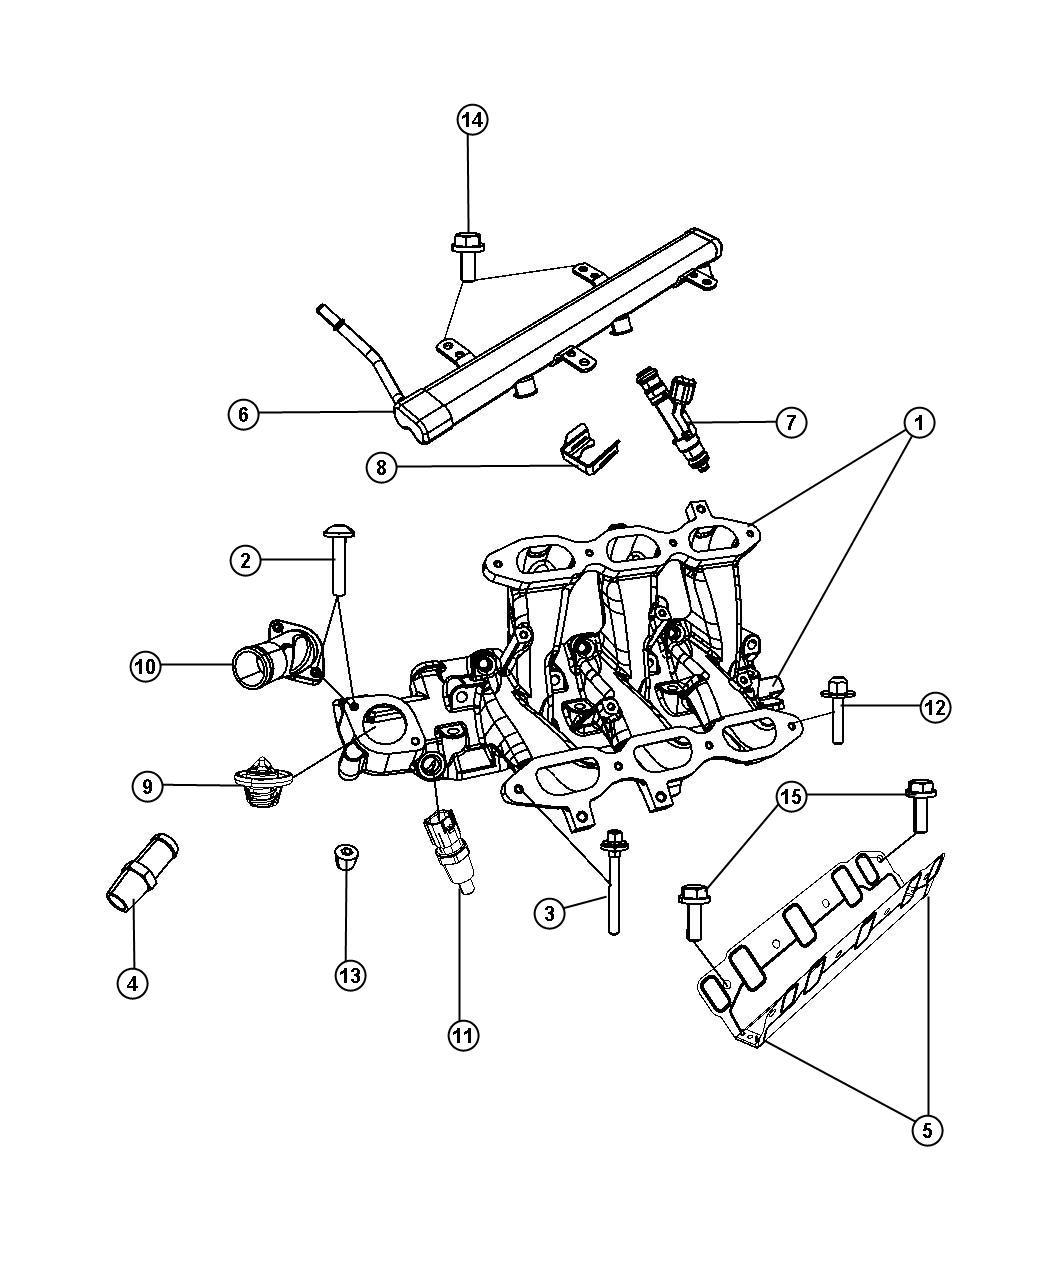 Jeep Wrangler Nipple. 375-18x2.00. Heater hose. Manifold